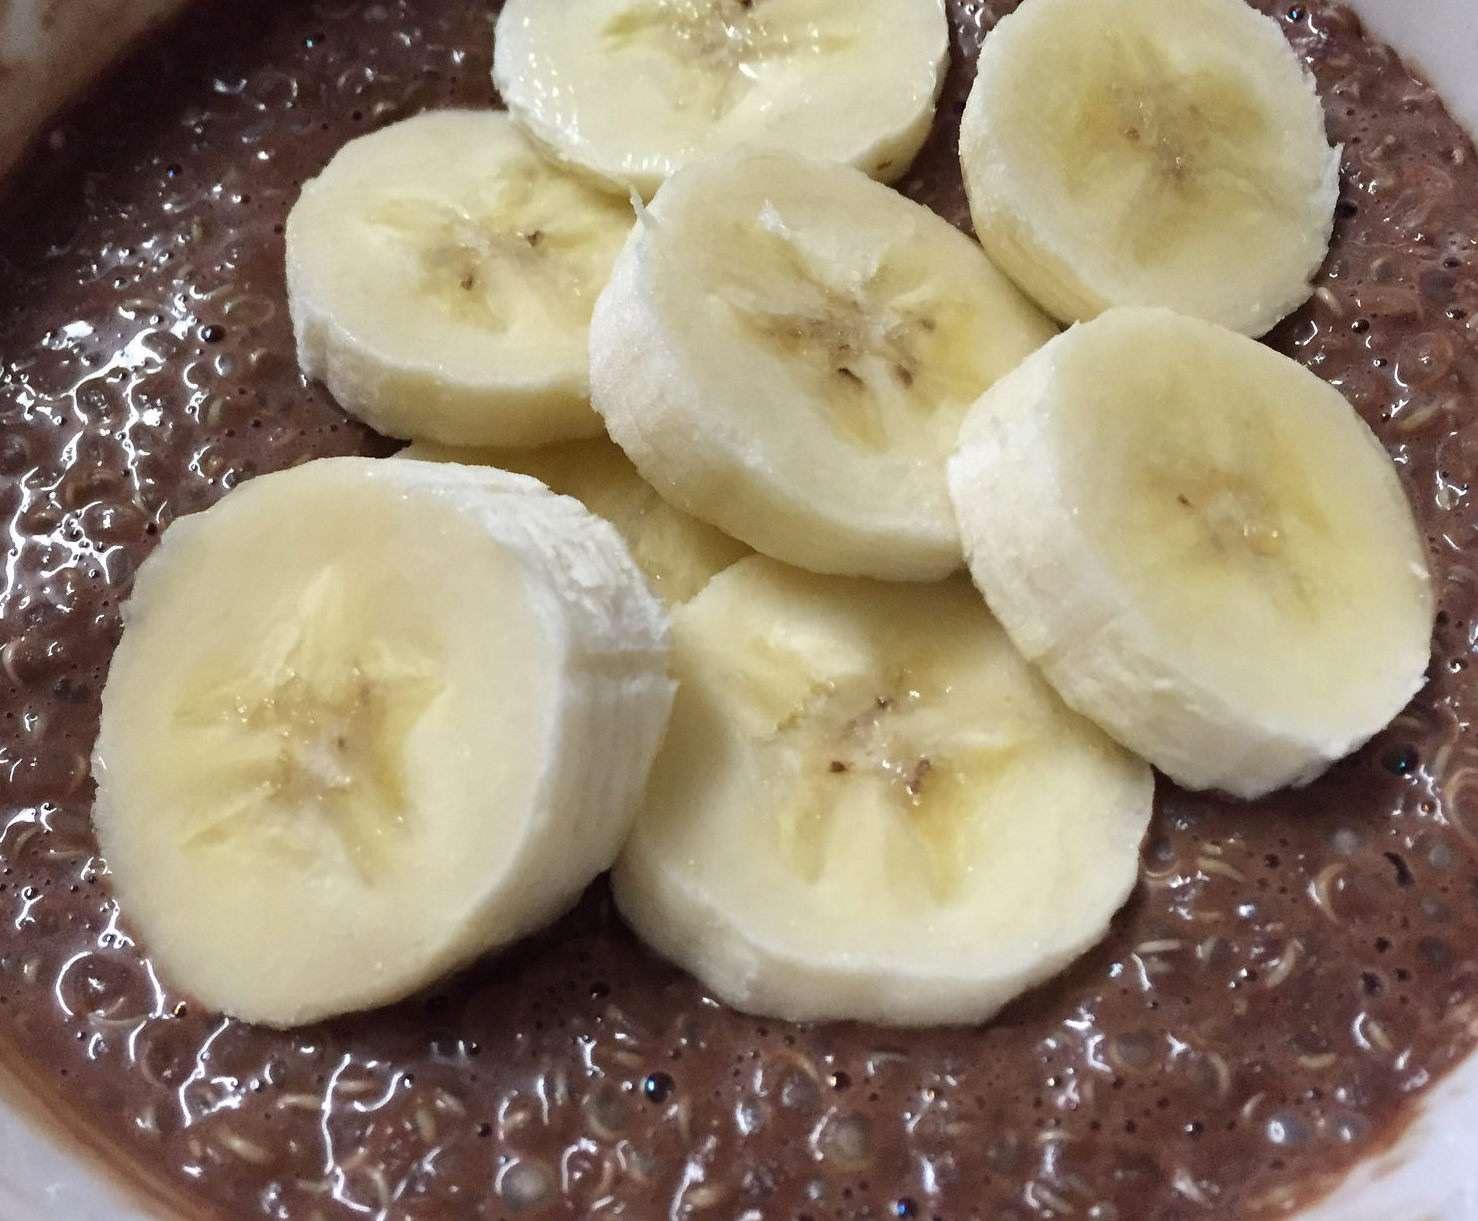 Chocolate banana quinoa breakfast bowl